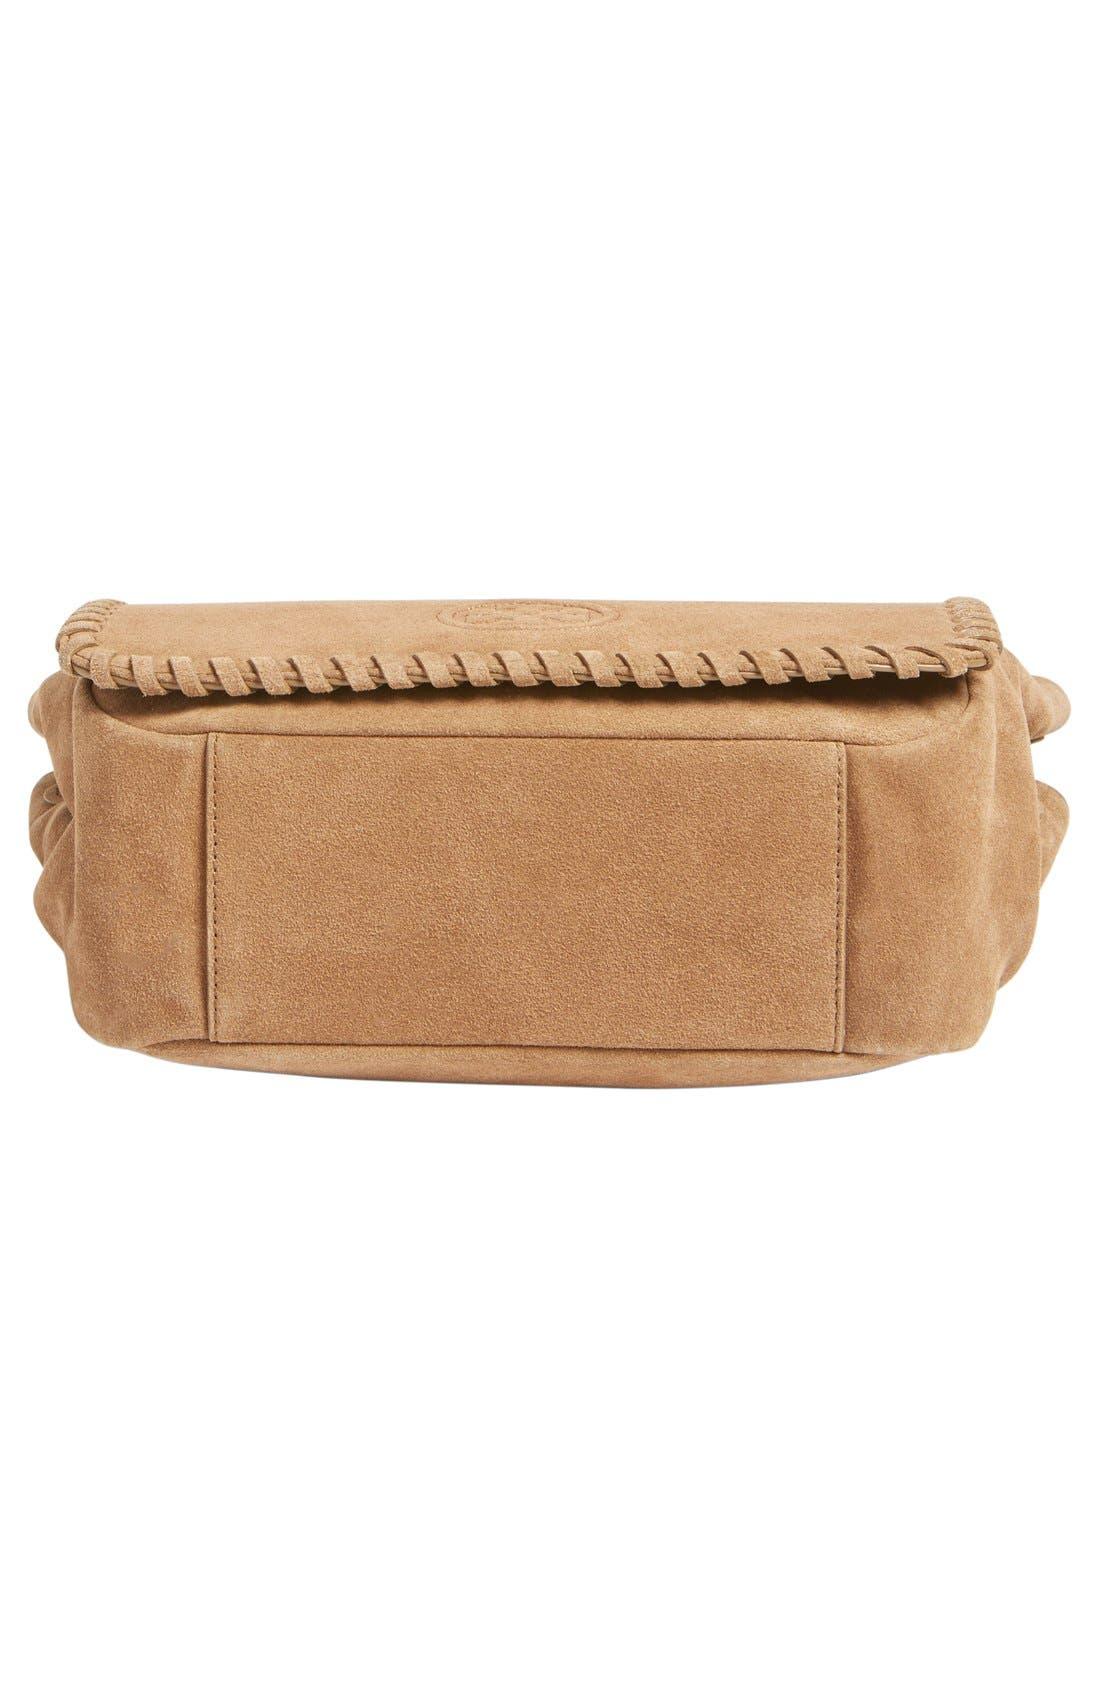 Alternate Image 4  - Tory Burch 'Small Marion' Suede Shoulder Bag